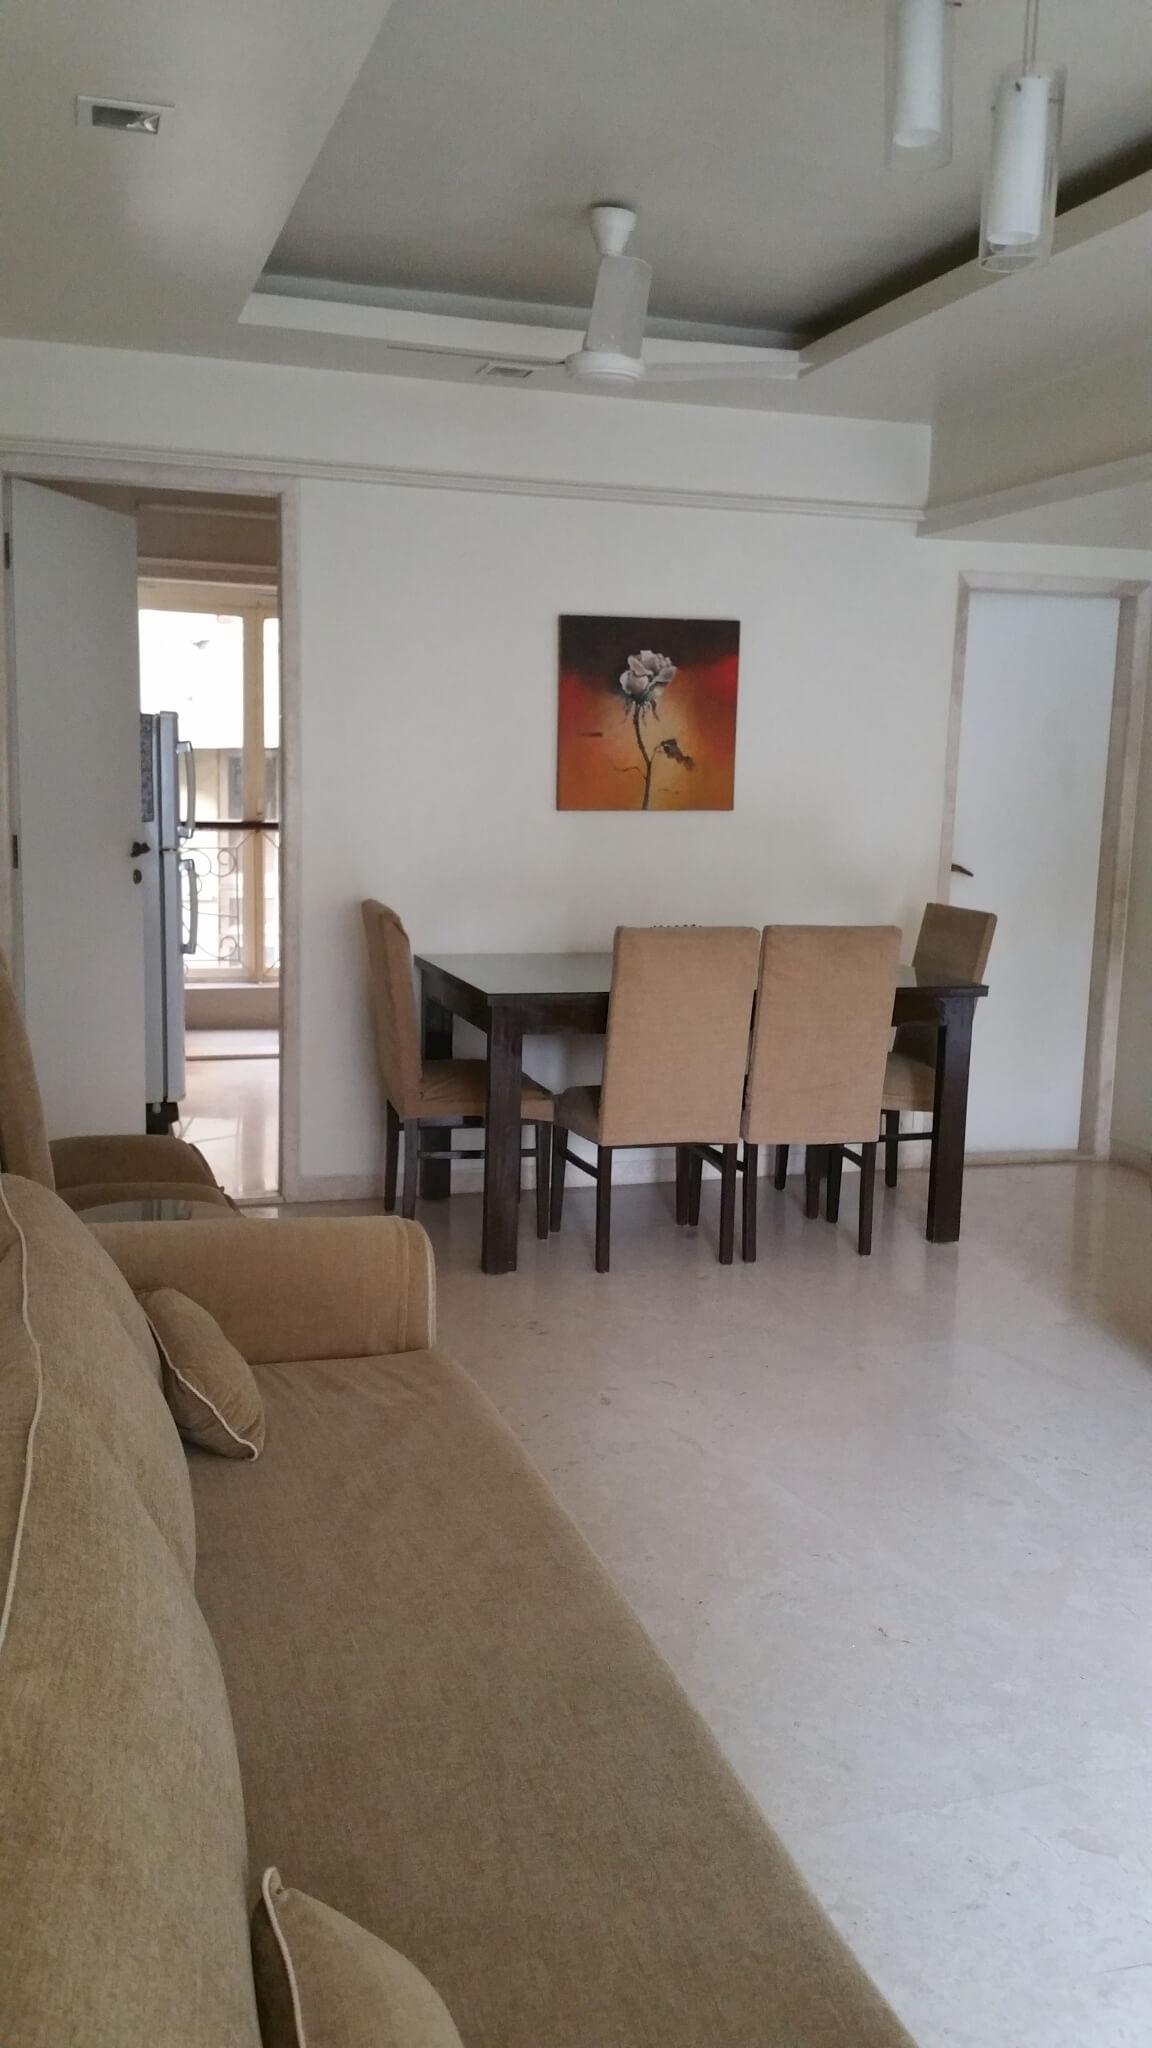 Cheap 2 Bedroom House For Rent: Monthly Rental 2 Bedroom Service Apartment Santacruz